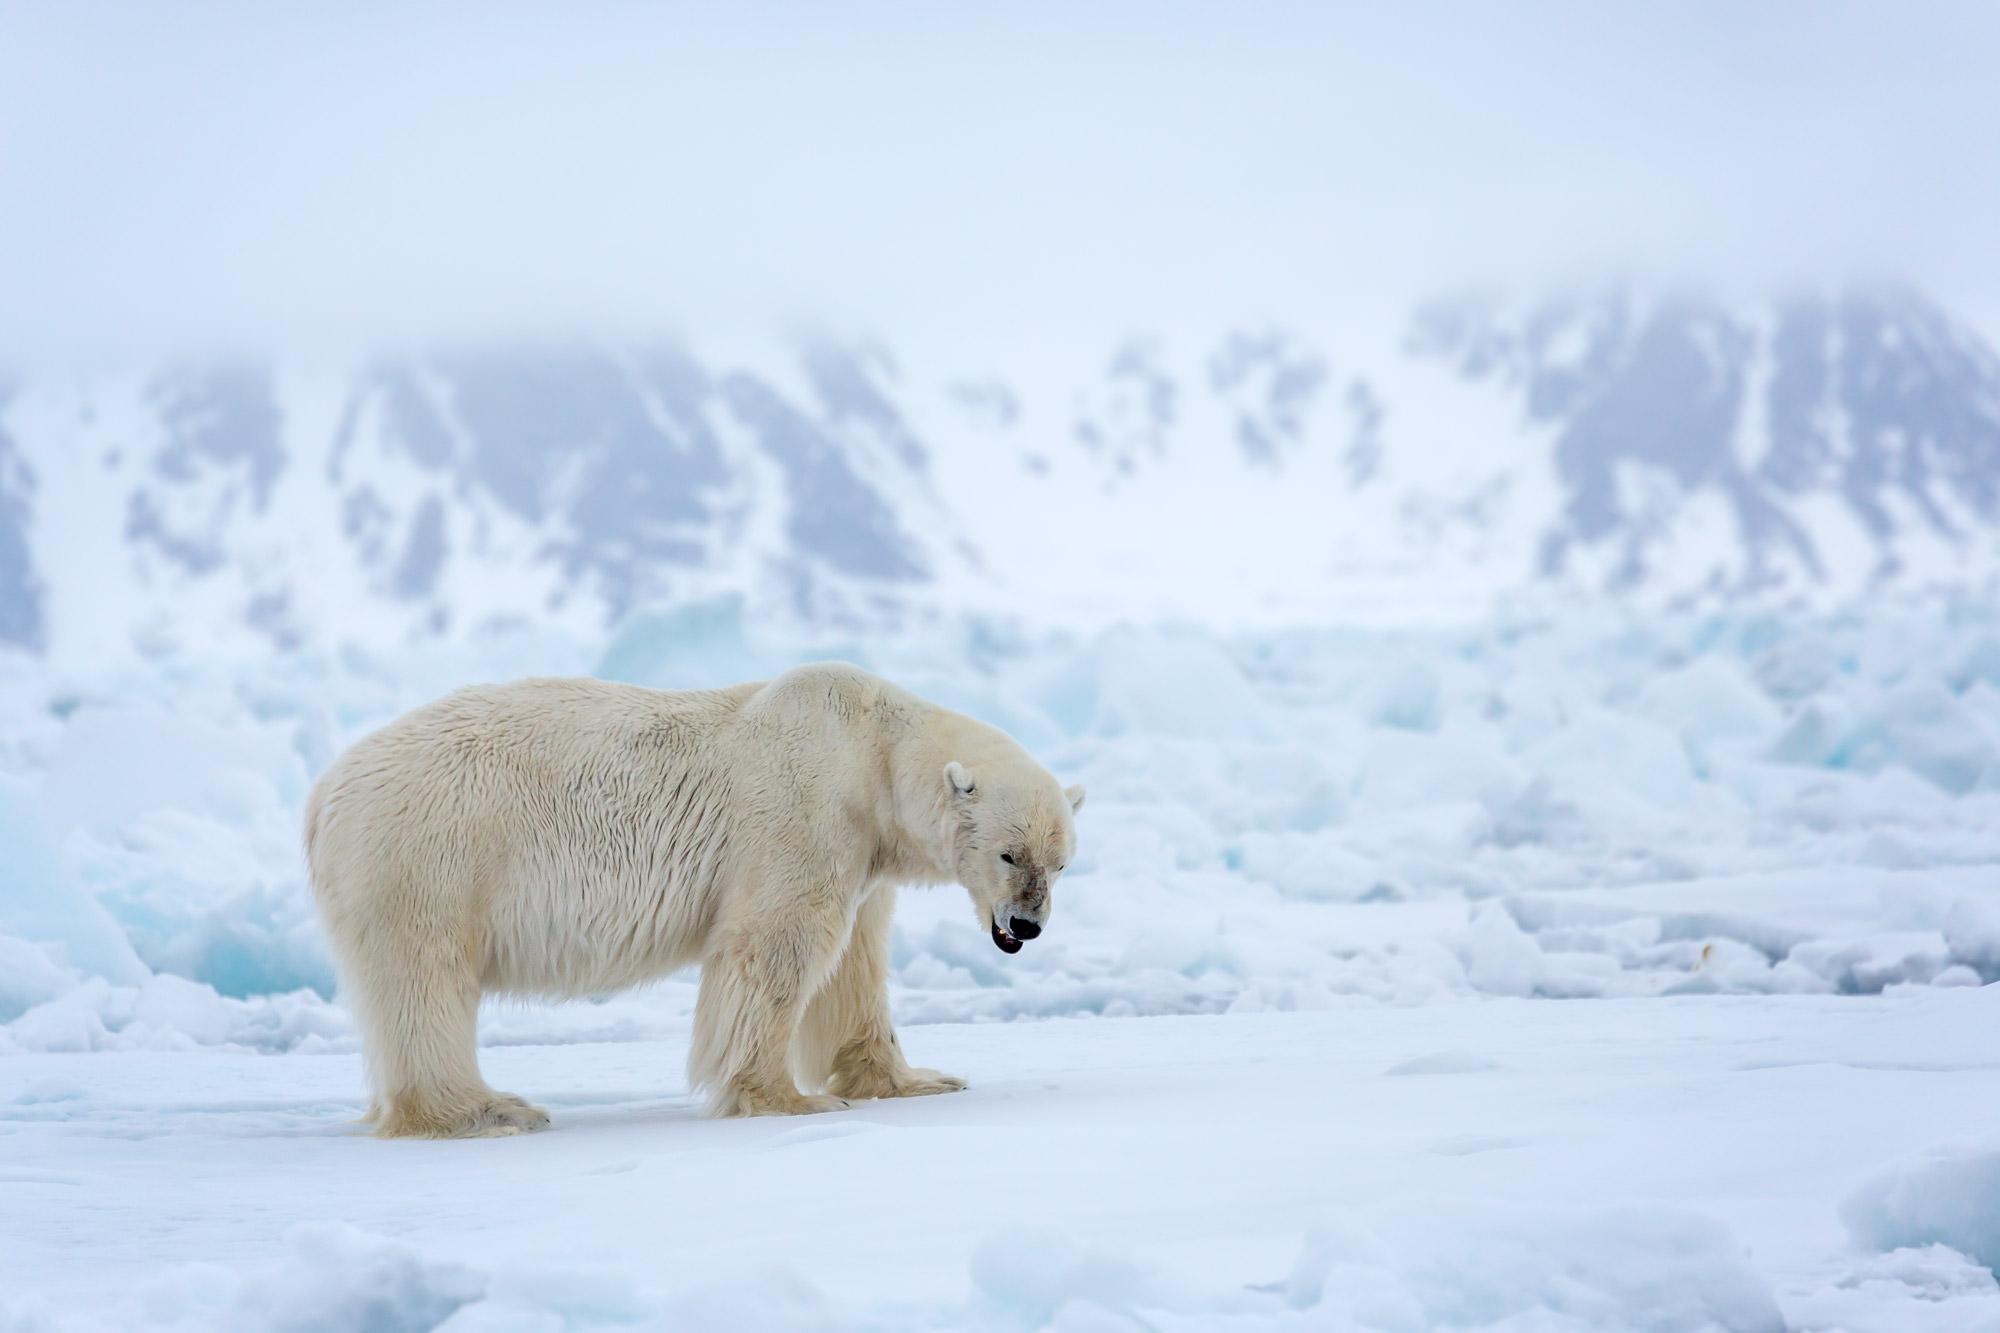 Bear, Polar Bear, Norway, Spitsbergen, limited edition, photograph. fine art, wildlife, photo